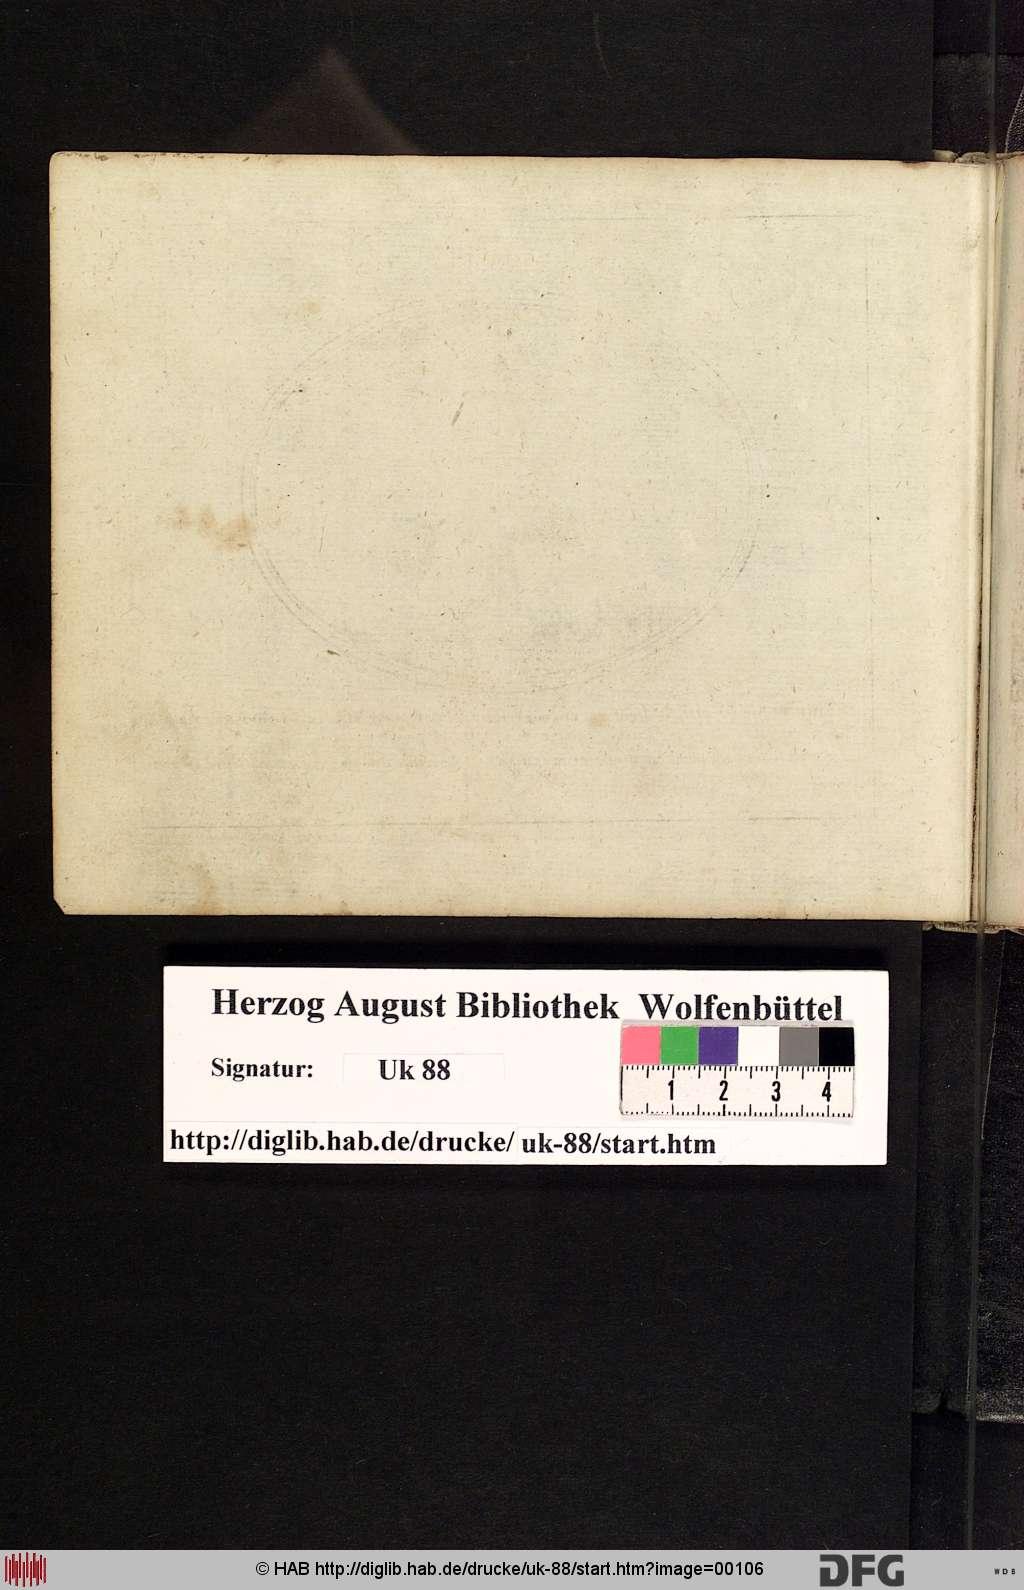 http://diglib.hab.de/drucke/uk-88/00106.jpg